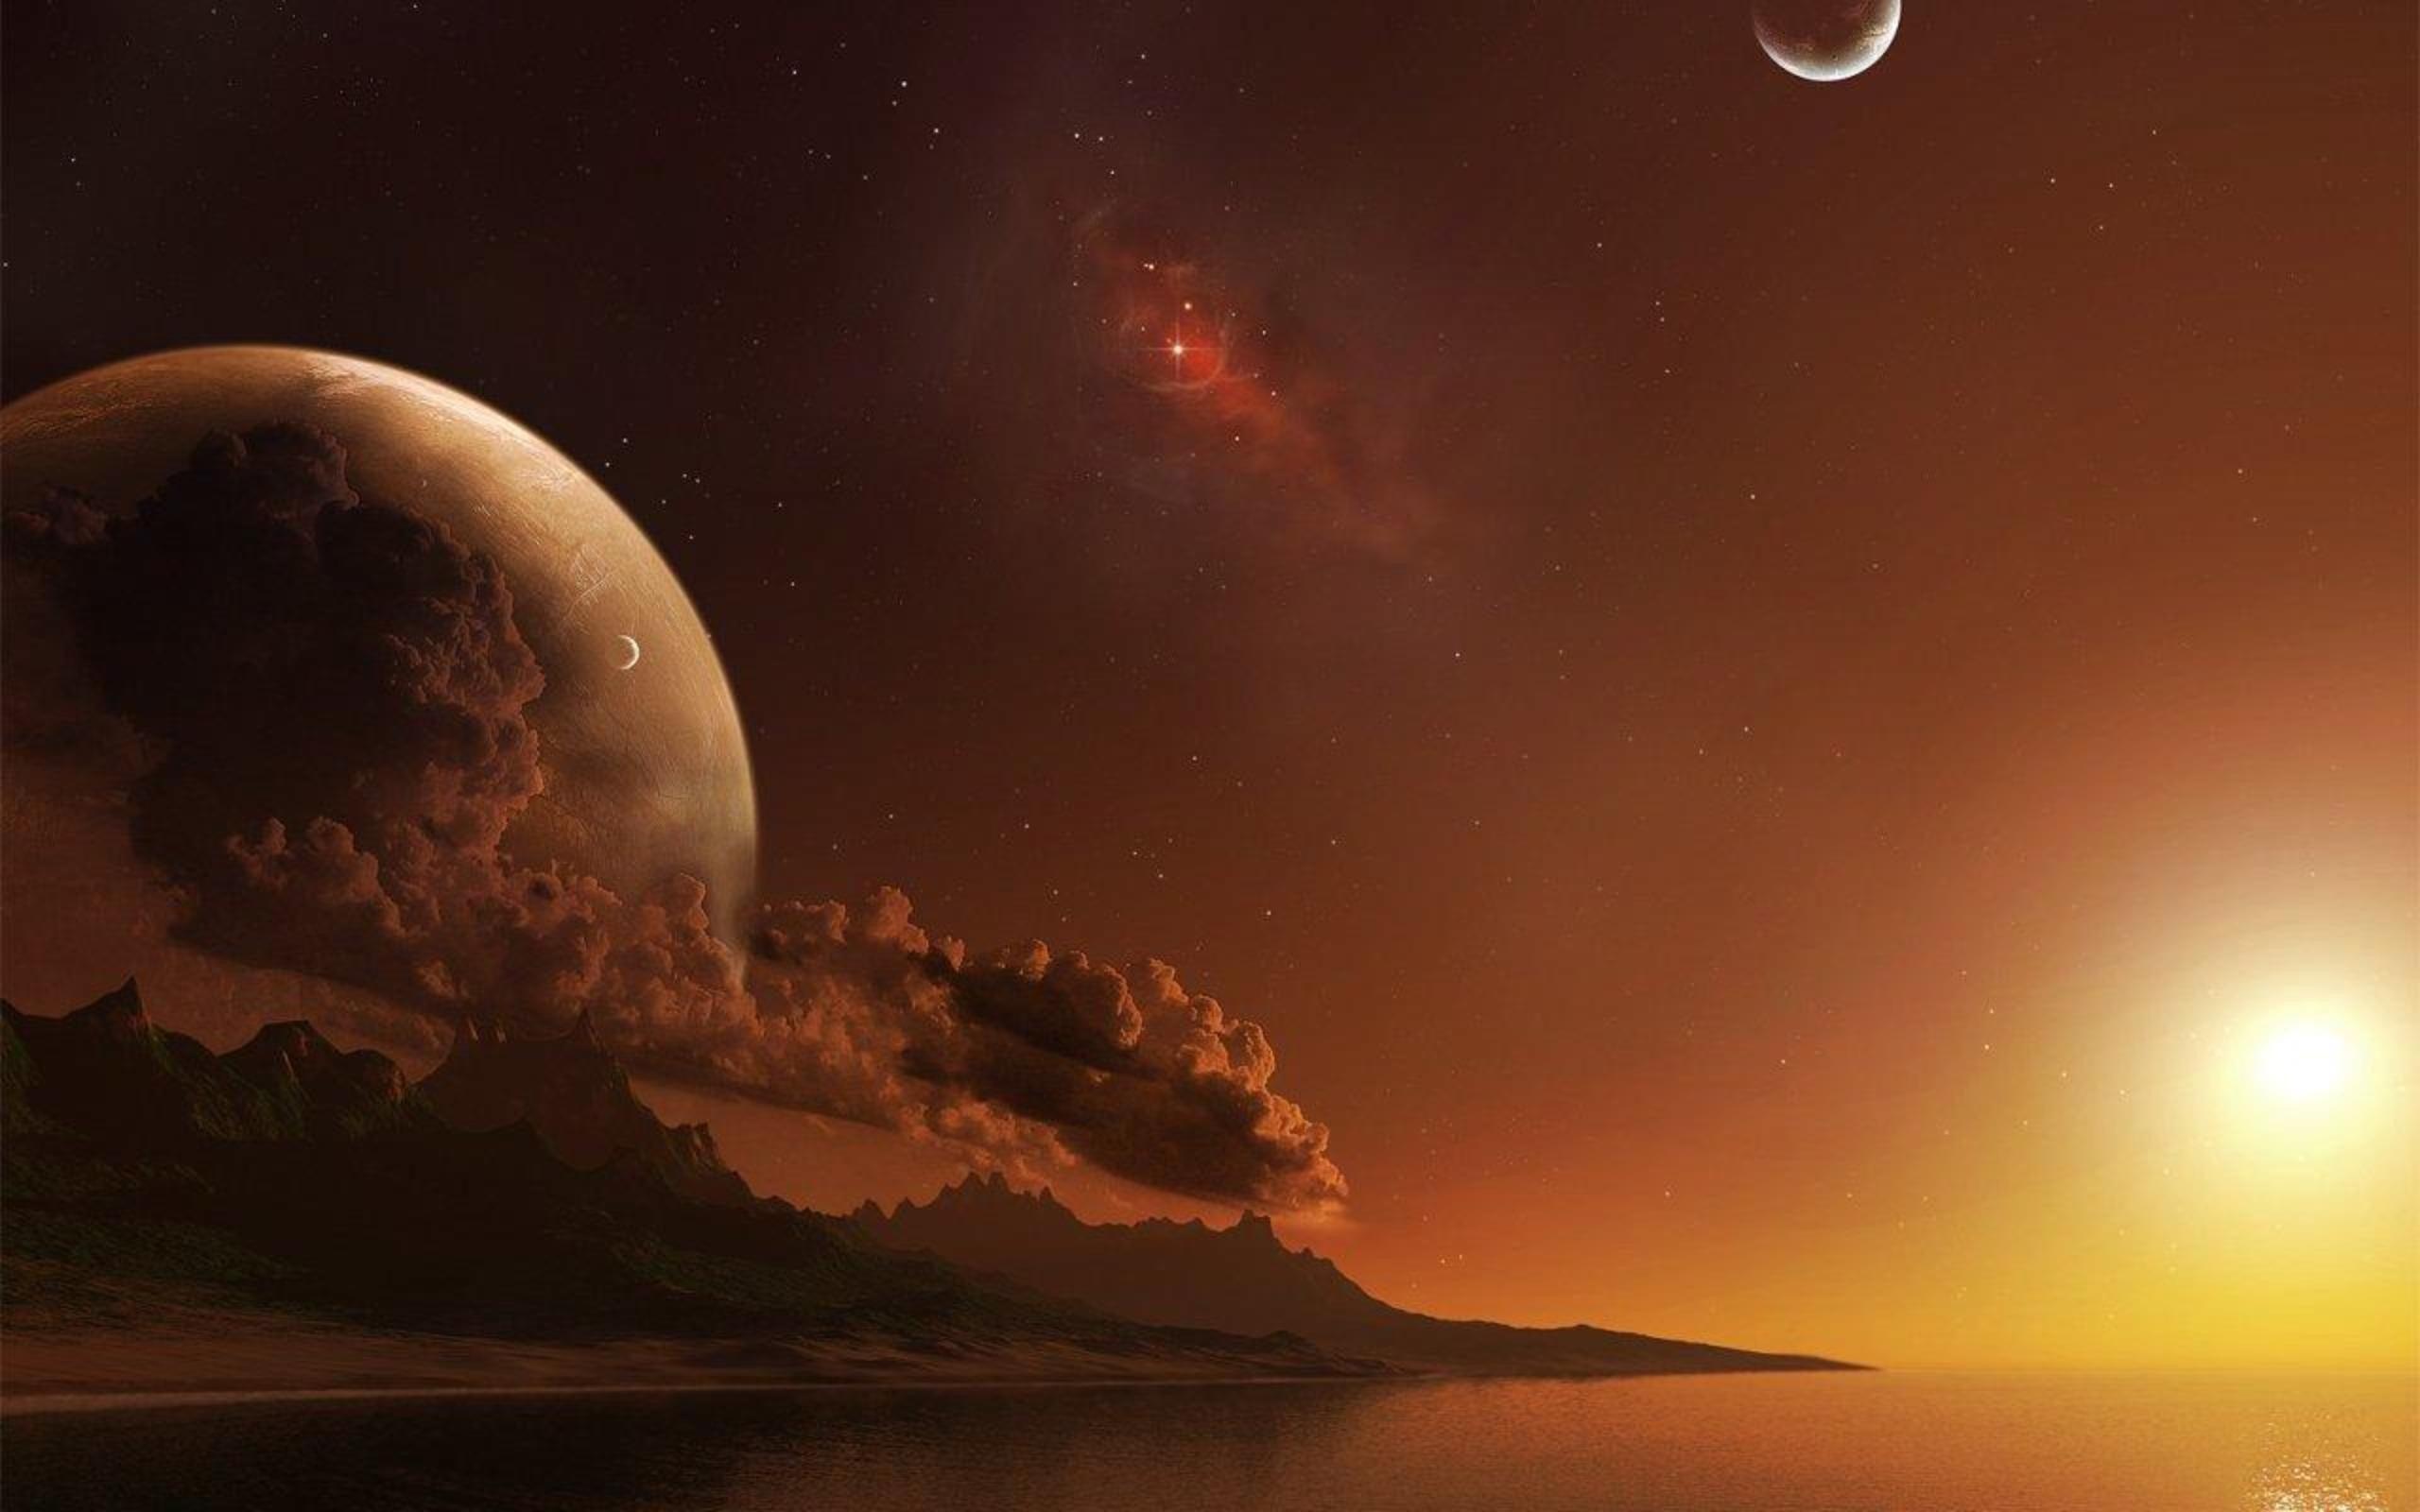 Digital art alien landscapes wallpaper | 2560x1600 ...